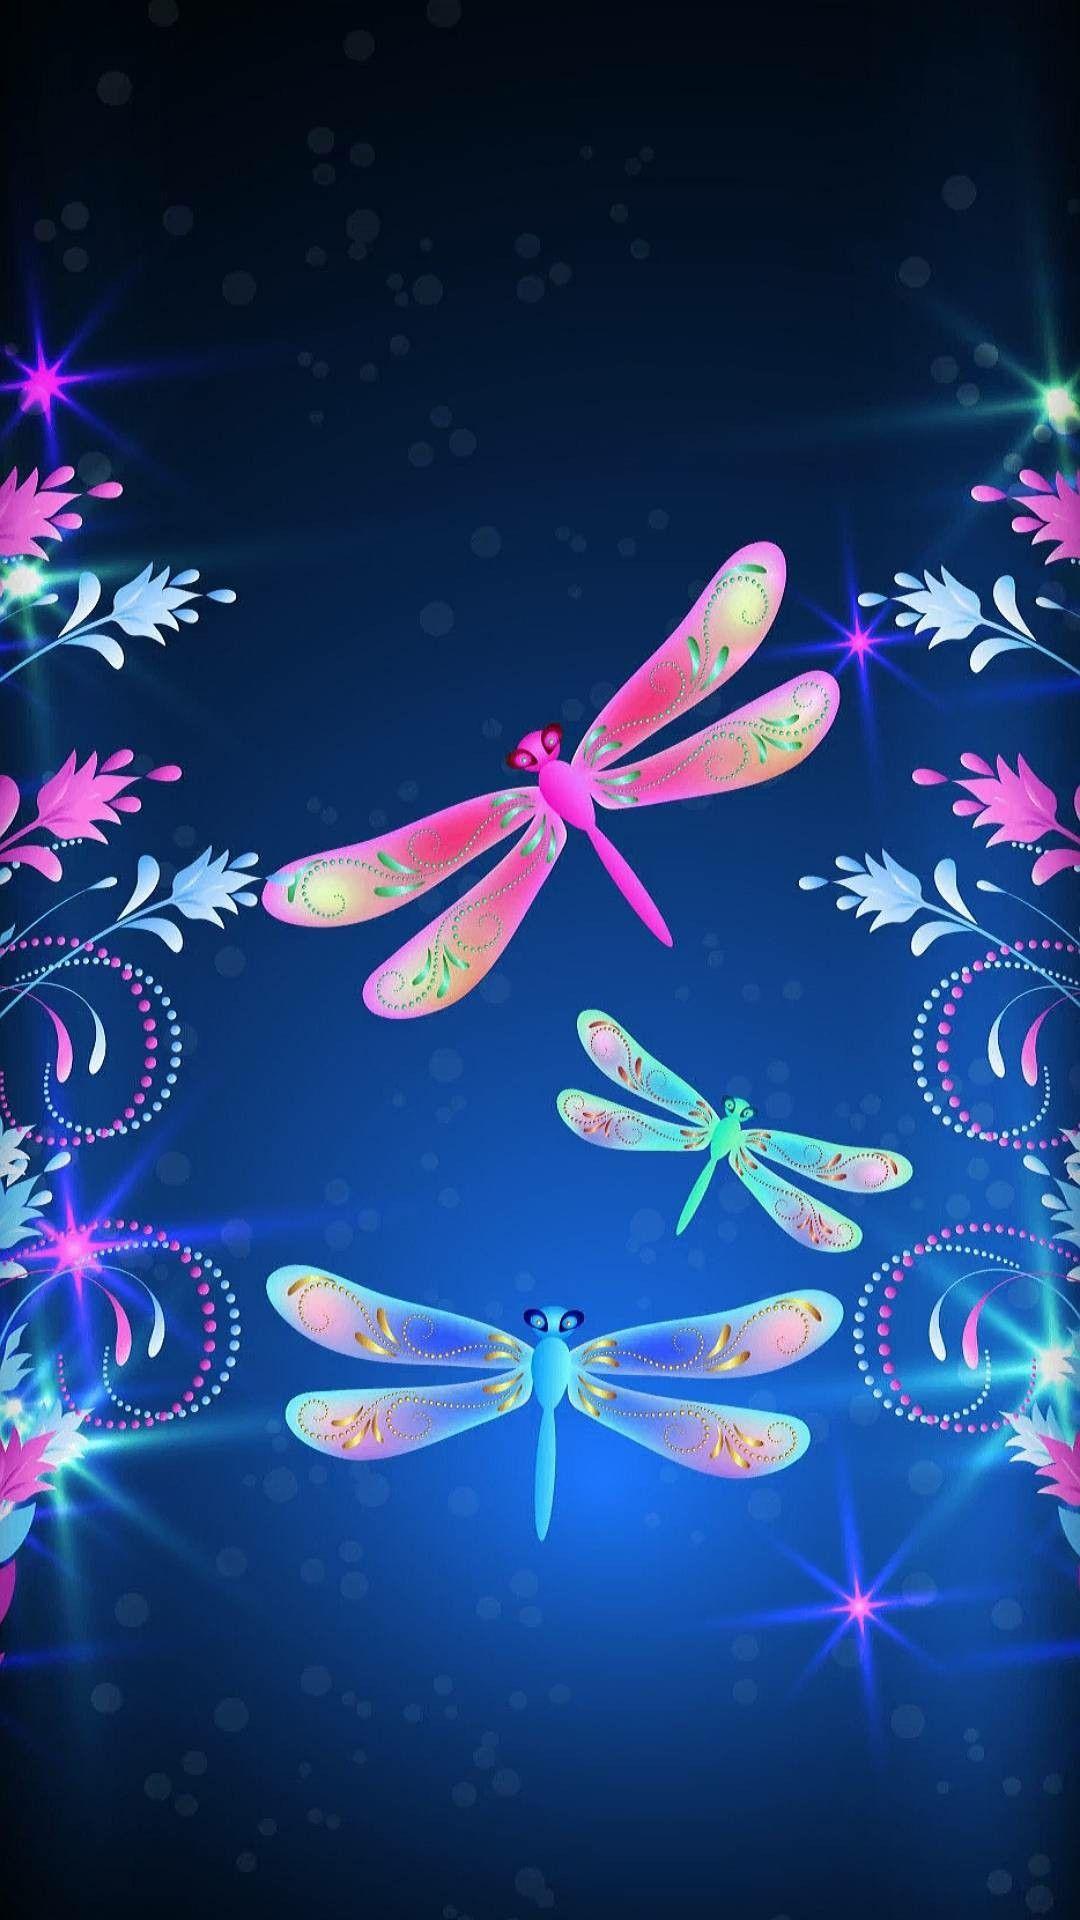 Dragonfly Wallpaper Dragonfly Wallpaper Dragonfly Wall Art Dragonfly Artwork